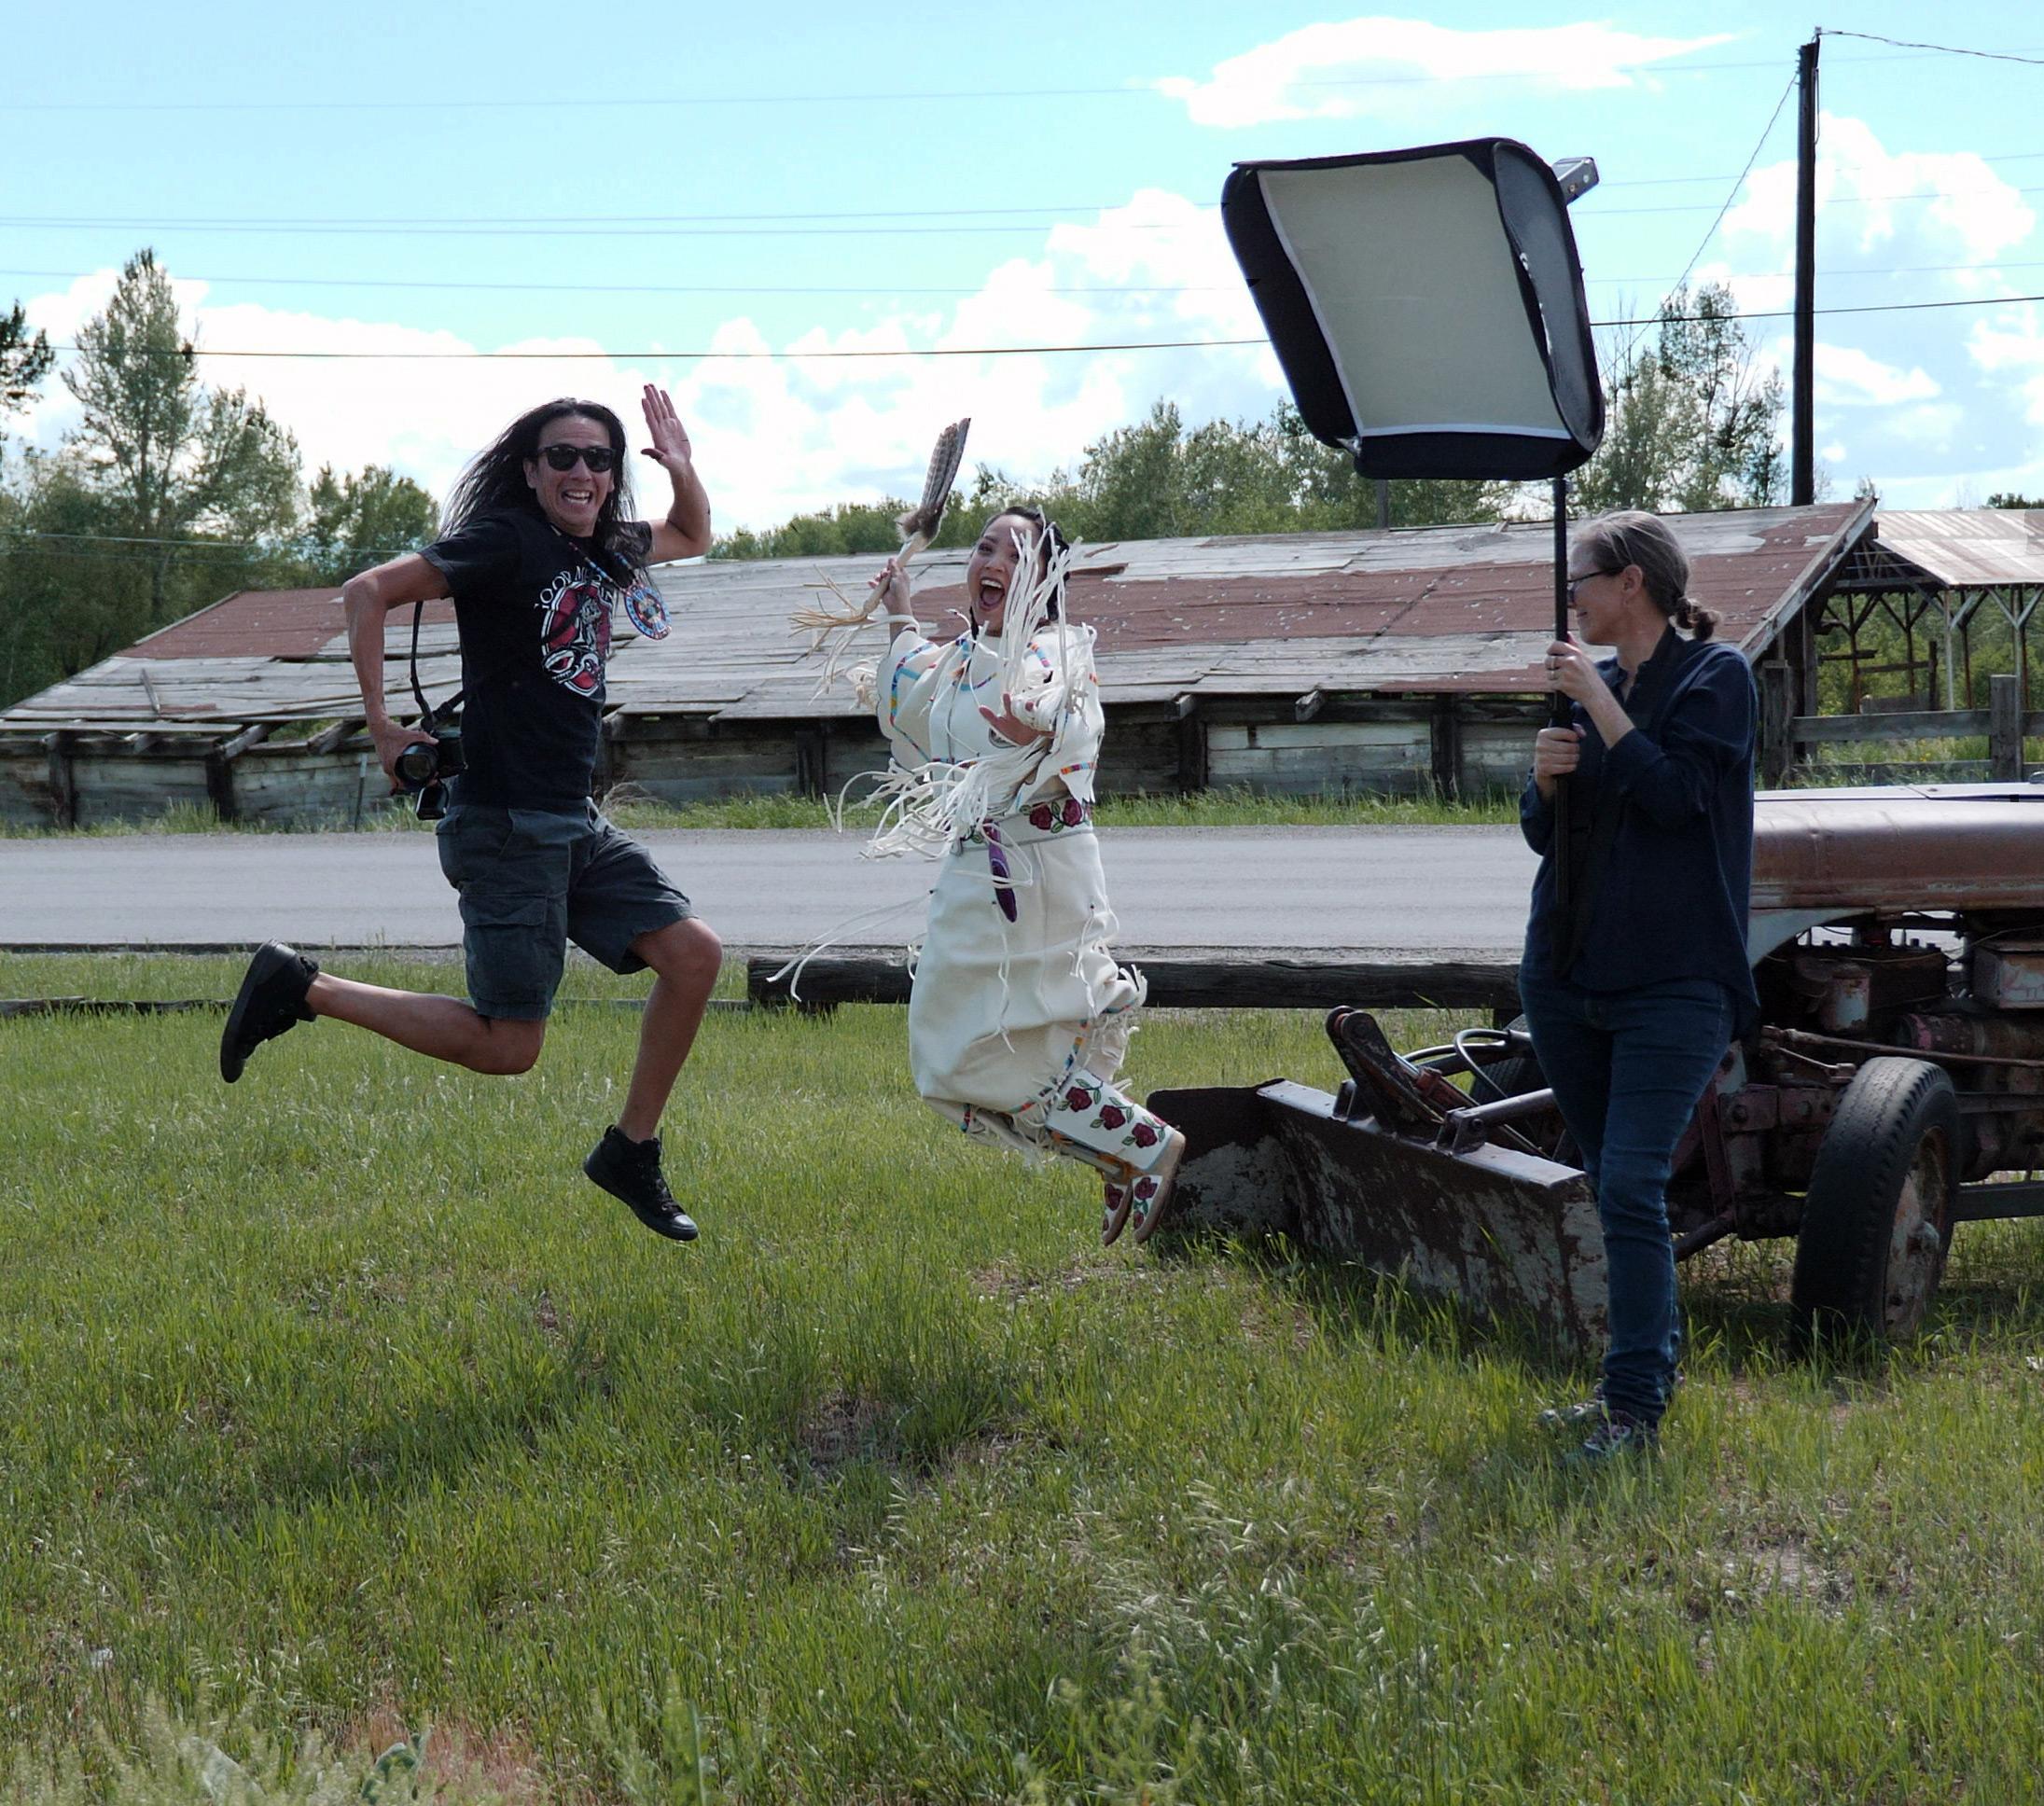 Production shot: Adam Sings In The Timber, Apsáalooke/Crow with   Alisha Nicole Fisher, Tsitsistas/Northern Cheyenne and Apsáalooke/Crow,   2019.